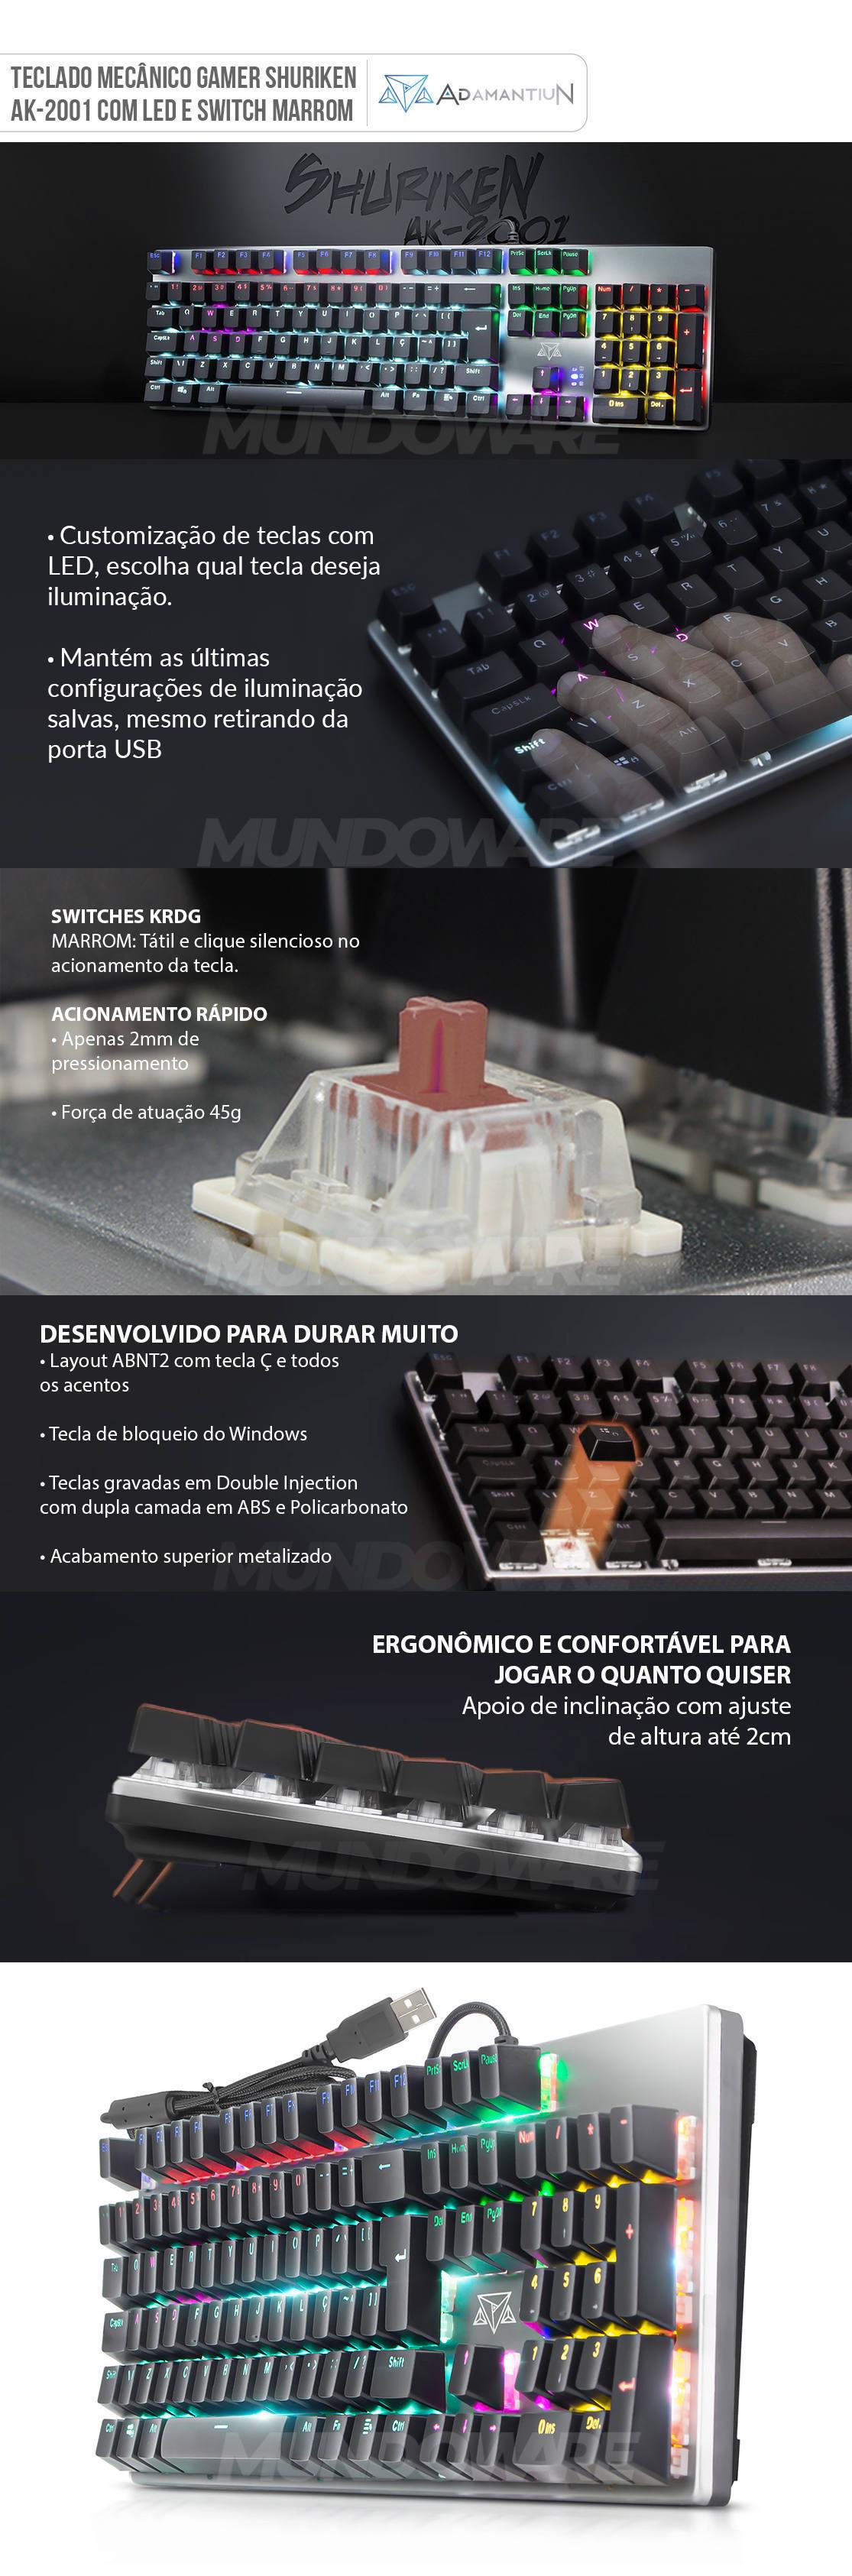 Teclado Mecânico Gamer Full Anti-Ghosting Switch Marrom KRGD 2mm LED CyberPunk ABNT2 Adamantiun Shuriken AK-2001